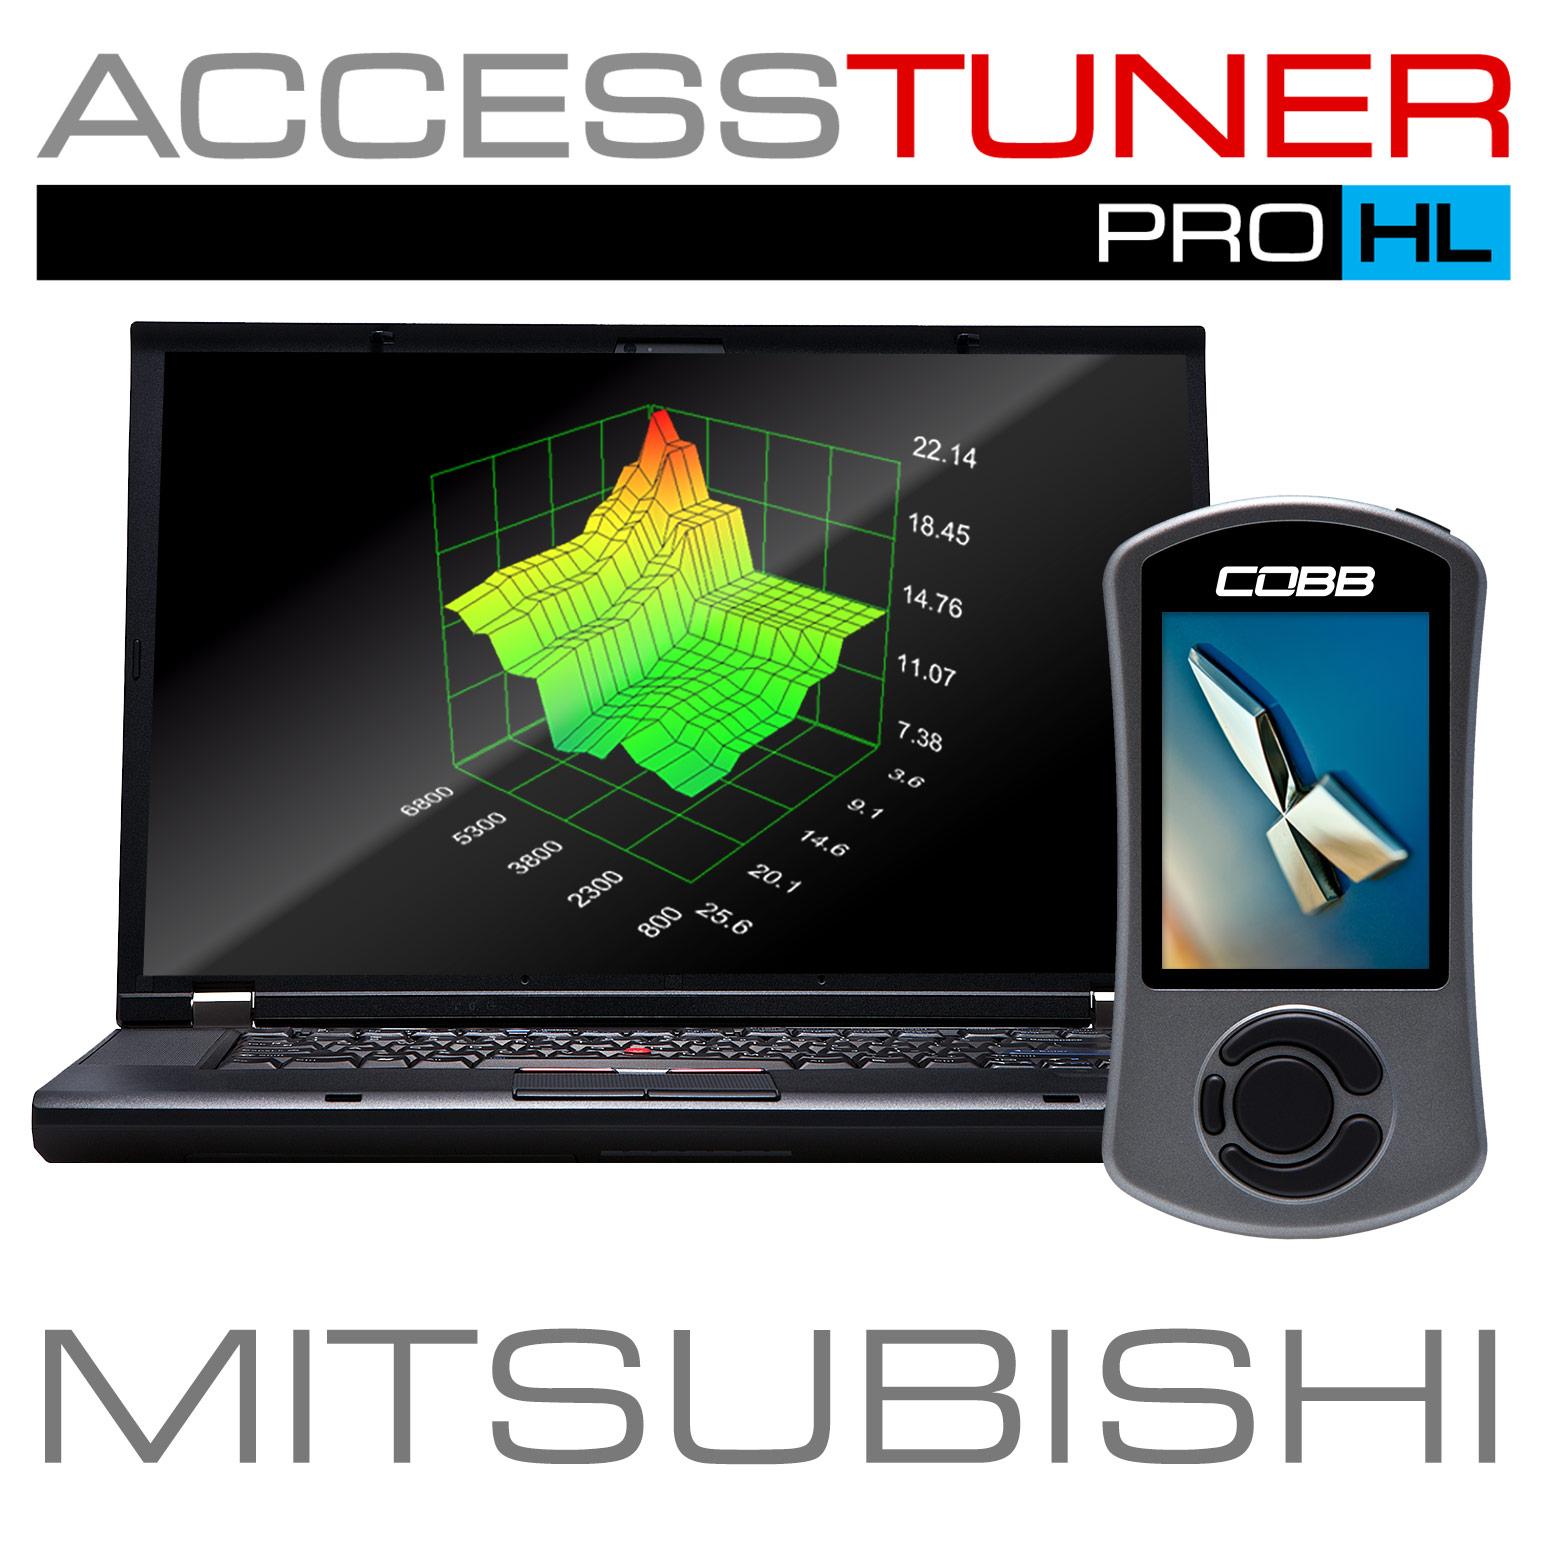 Mitsubishi Tv Tech Support: Mitsubishi Accesstuner Pro